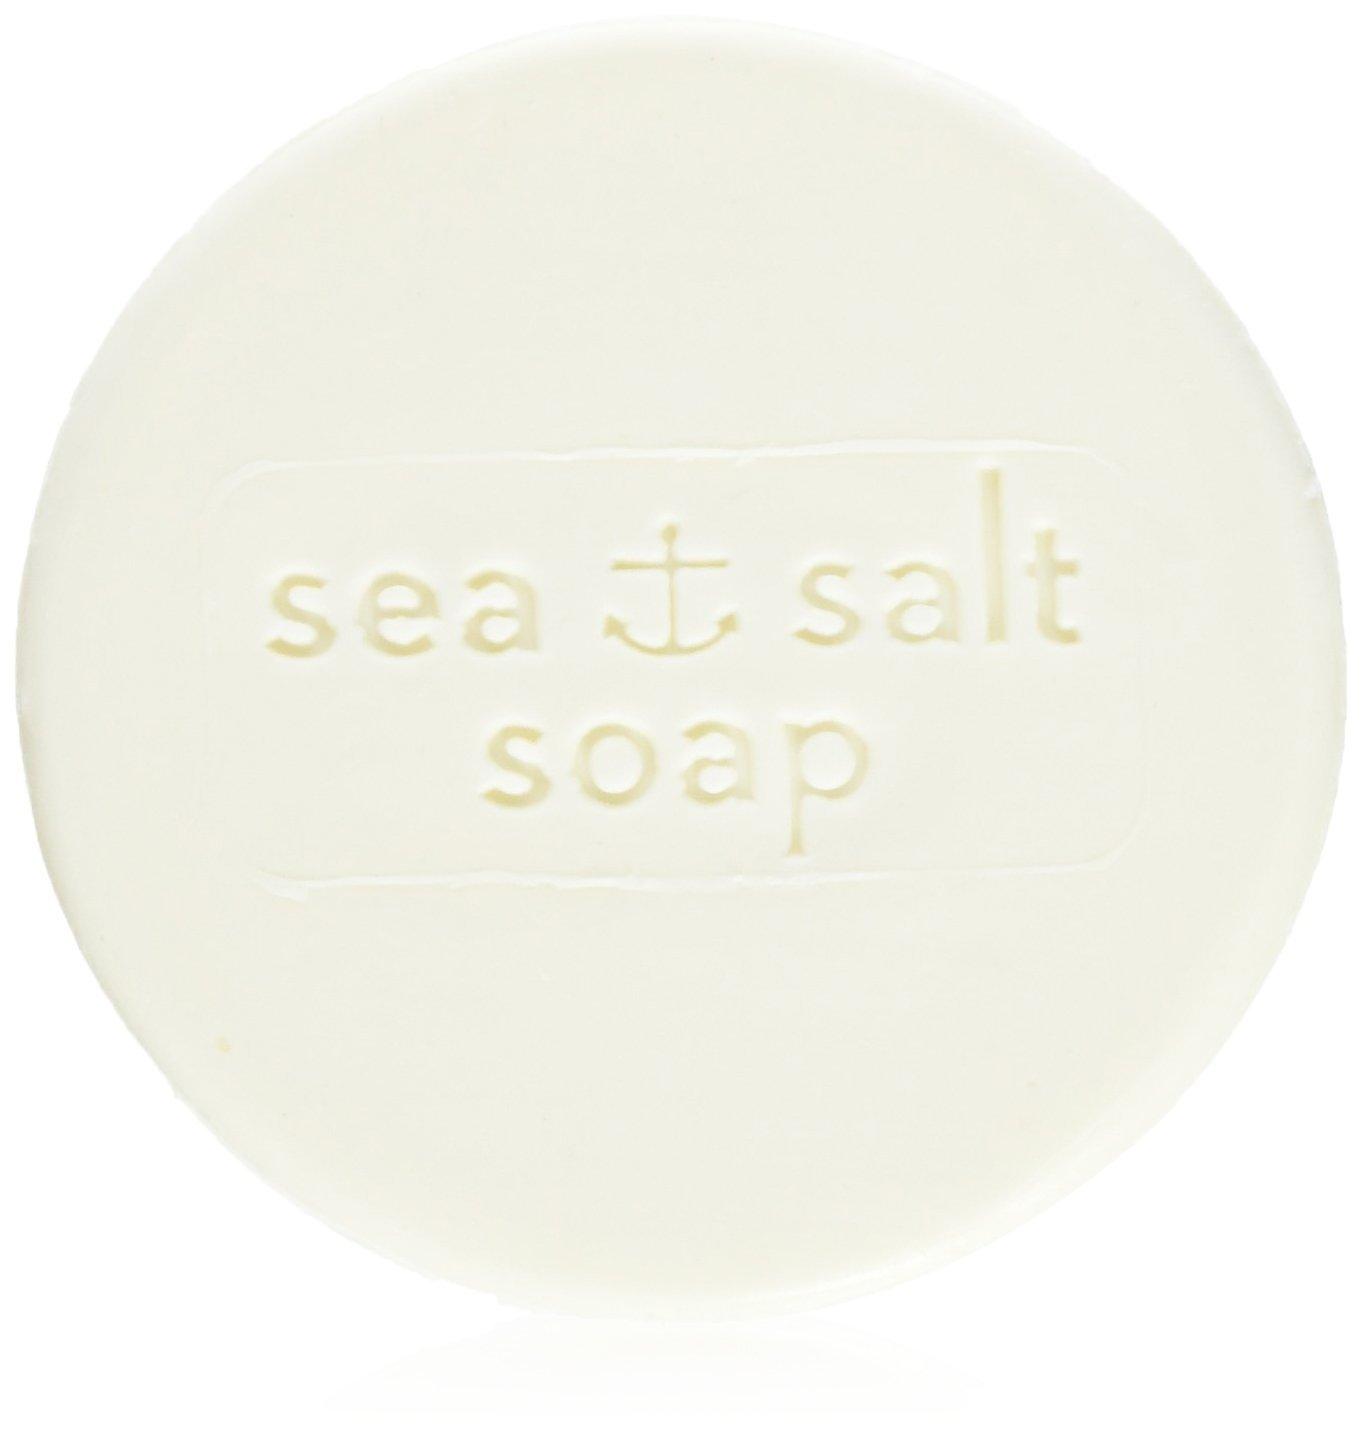 Swedish Dream Sea Salt Soap (122g) 570